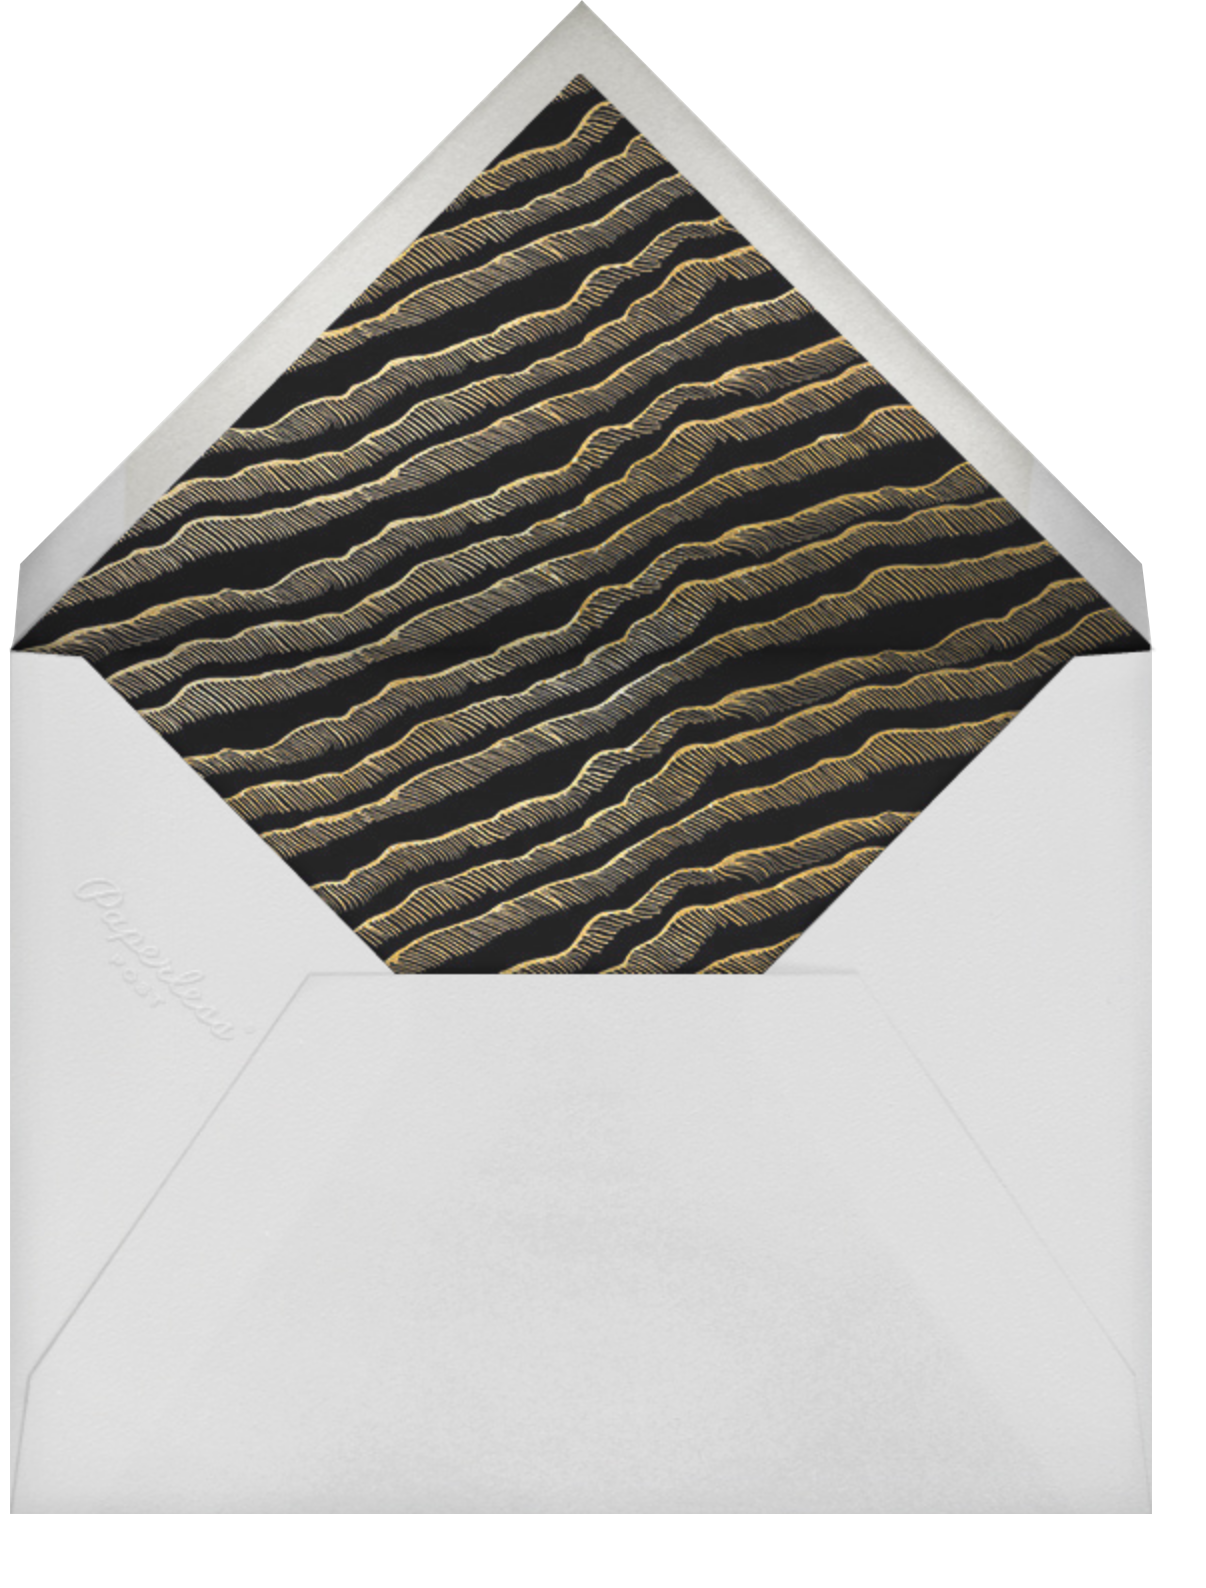 Hearth - Kelly Wearstler - Save the date - envelope back